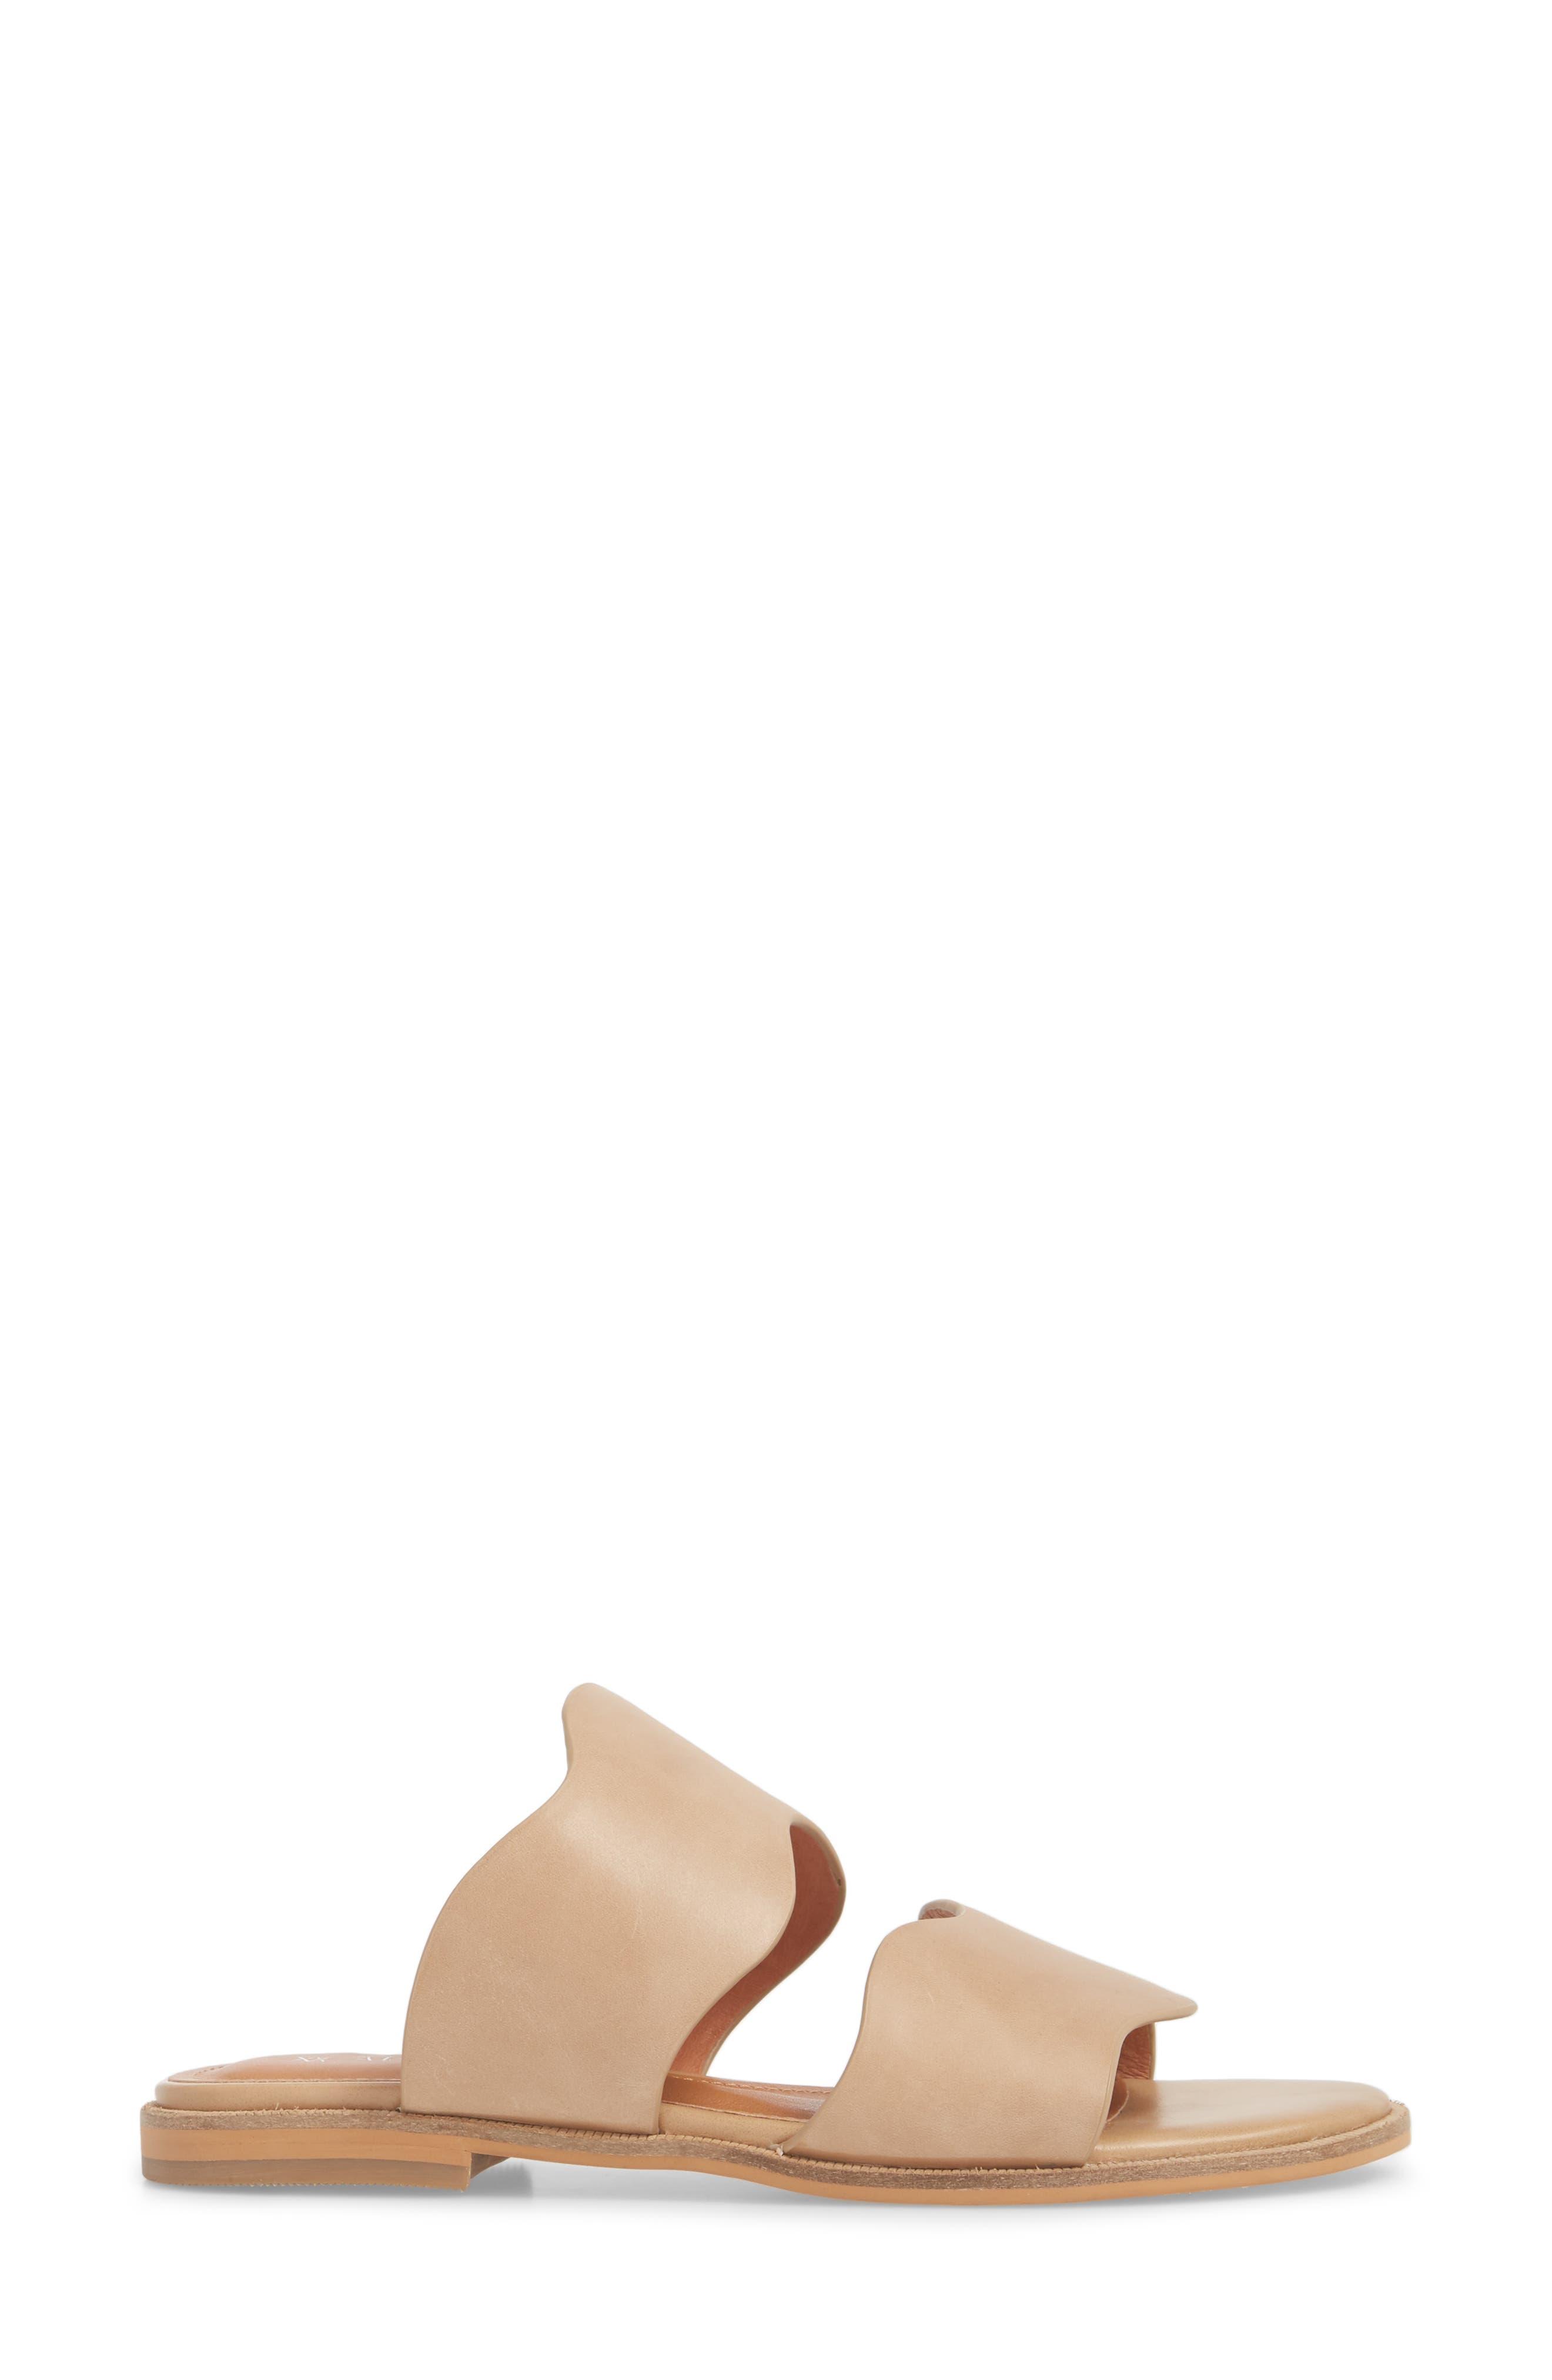 Thermos Scalloped Slide Sandal,                             Alternate thumbnail 3, color,                             250